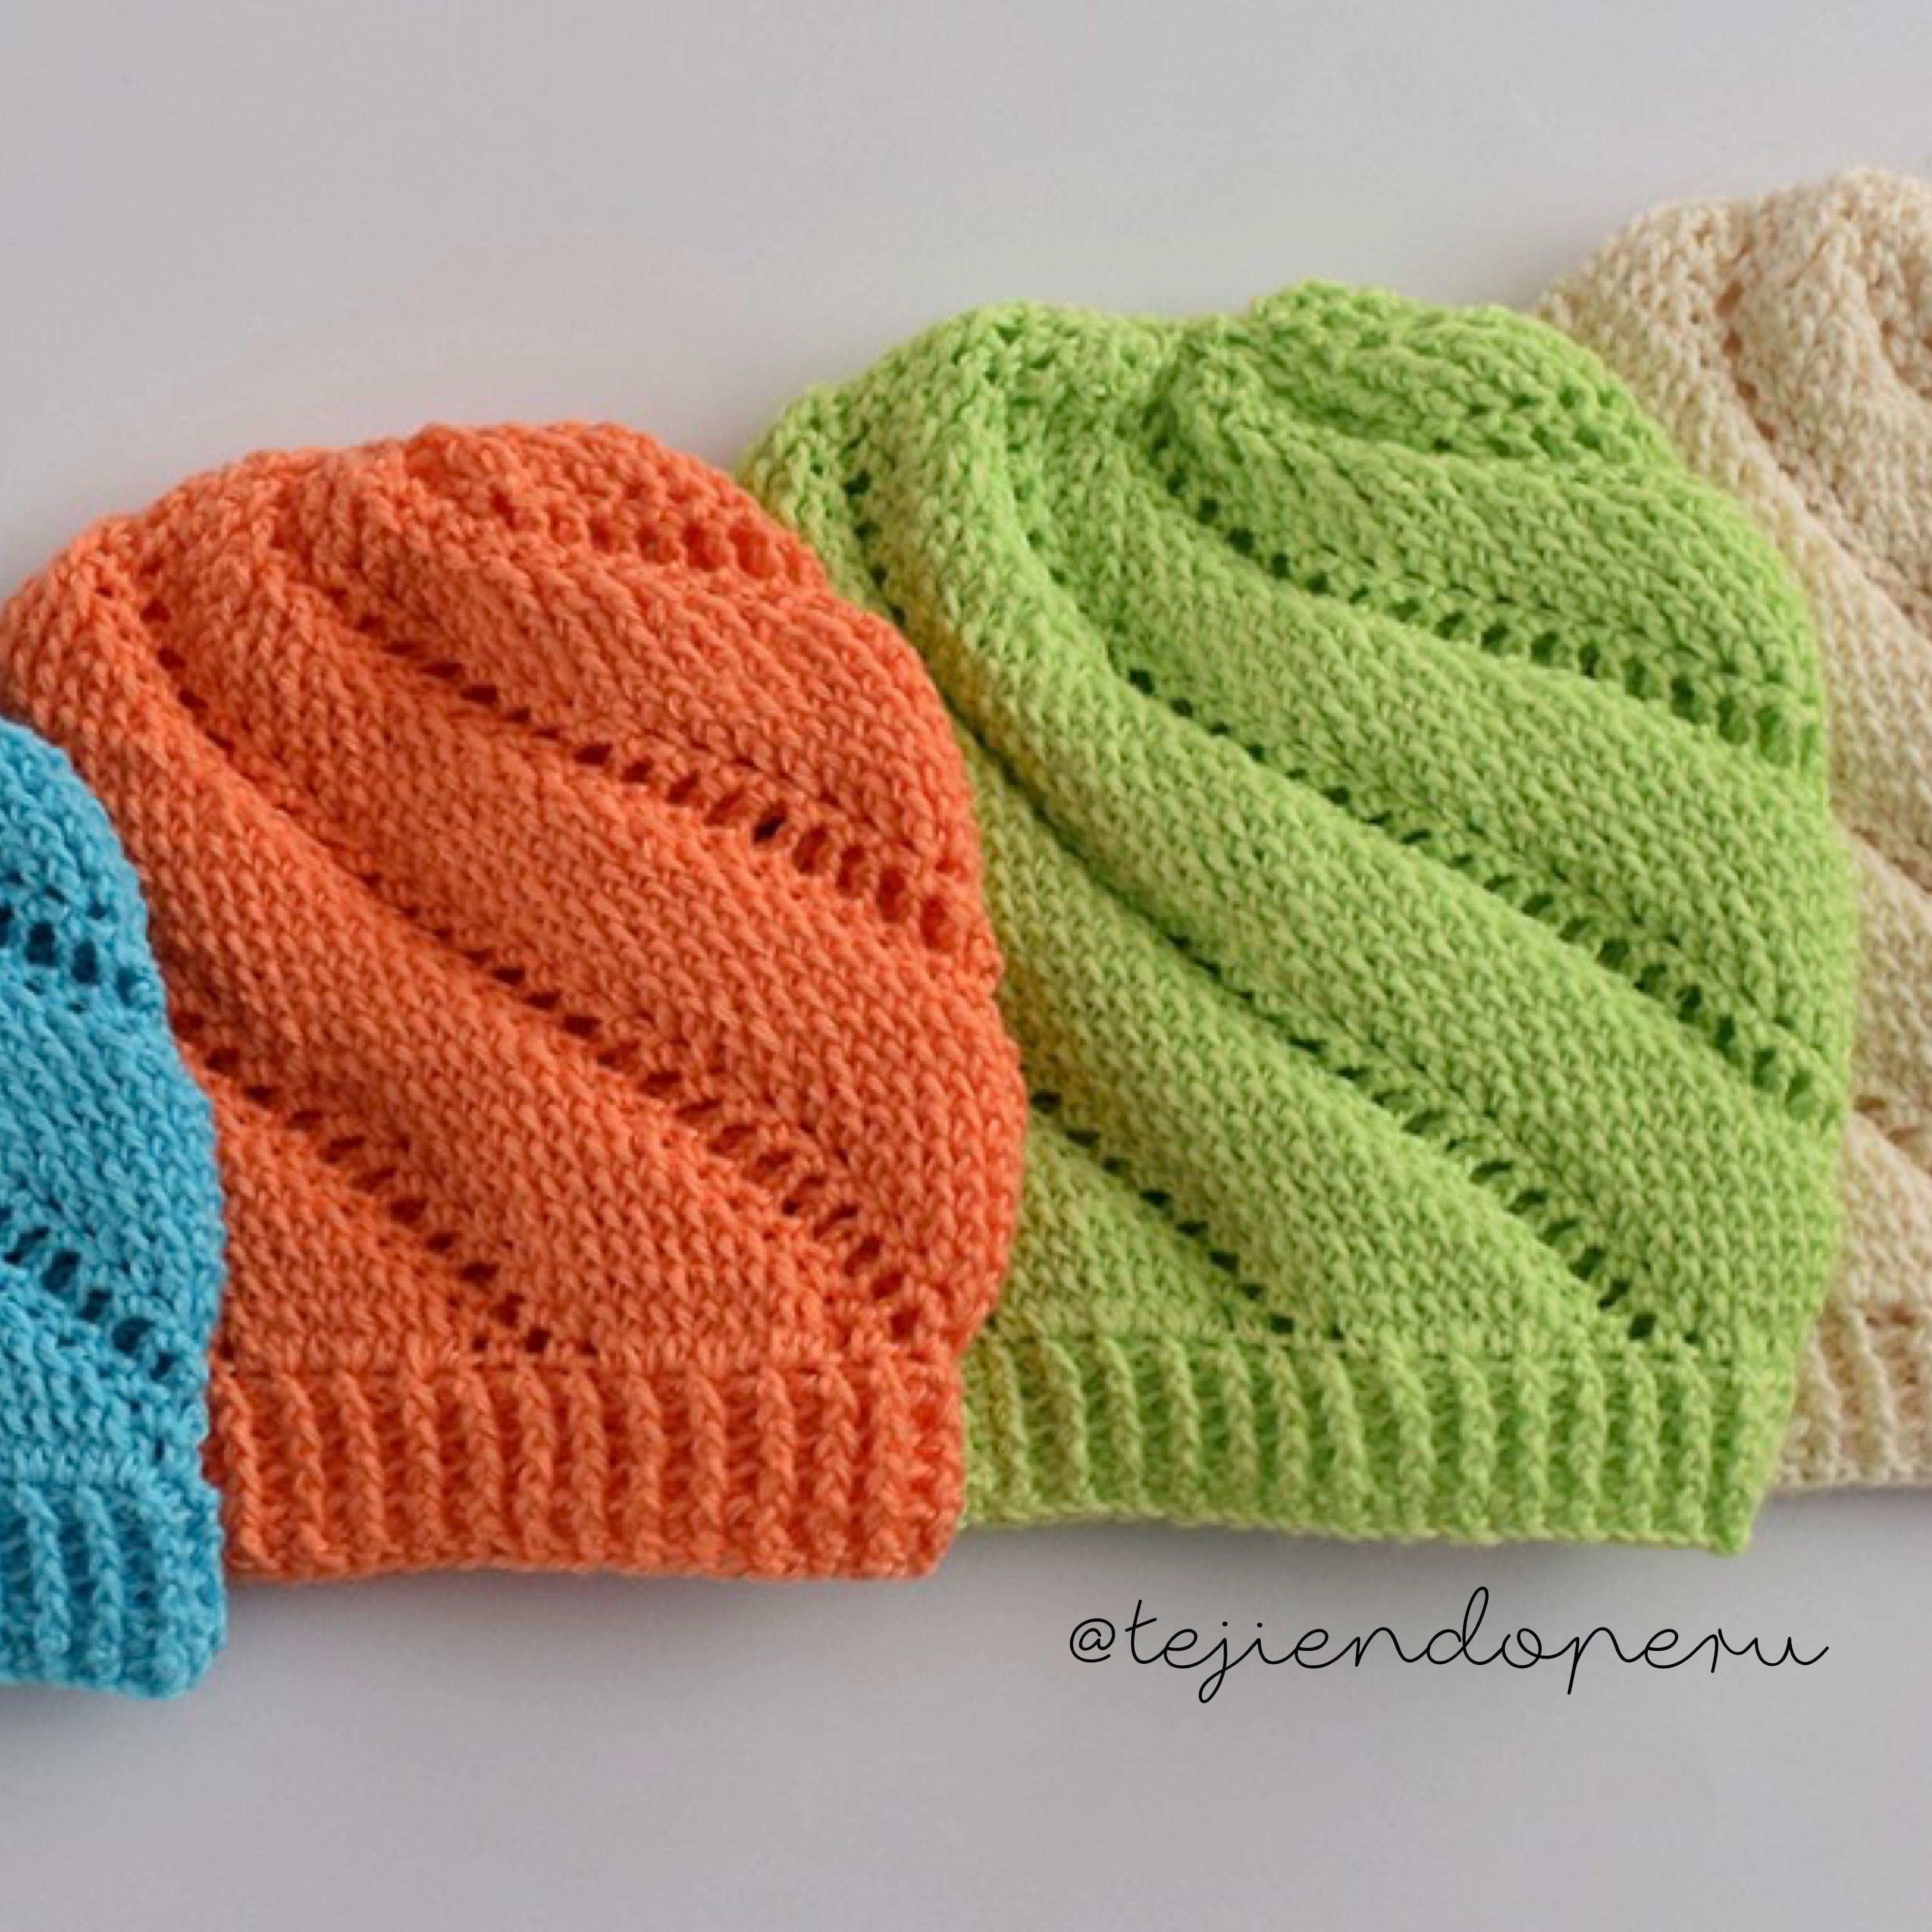 Gorros temolino tejidos a crochet pero que parecen tejidos a palitos ...